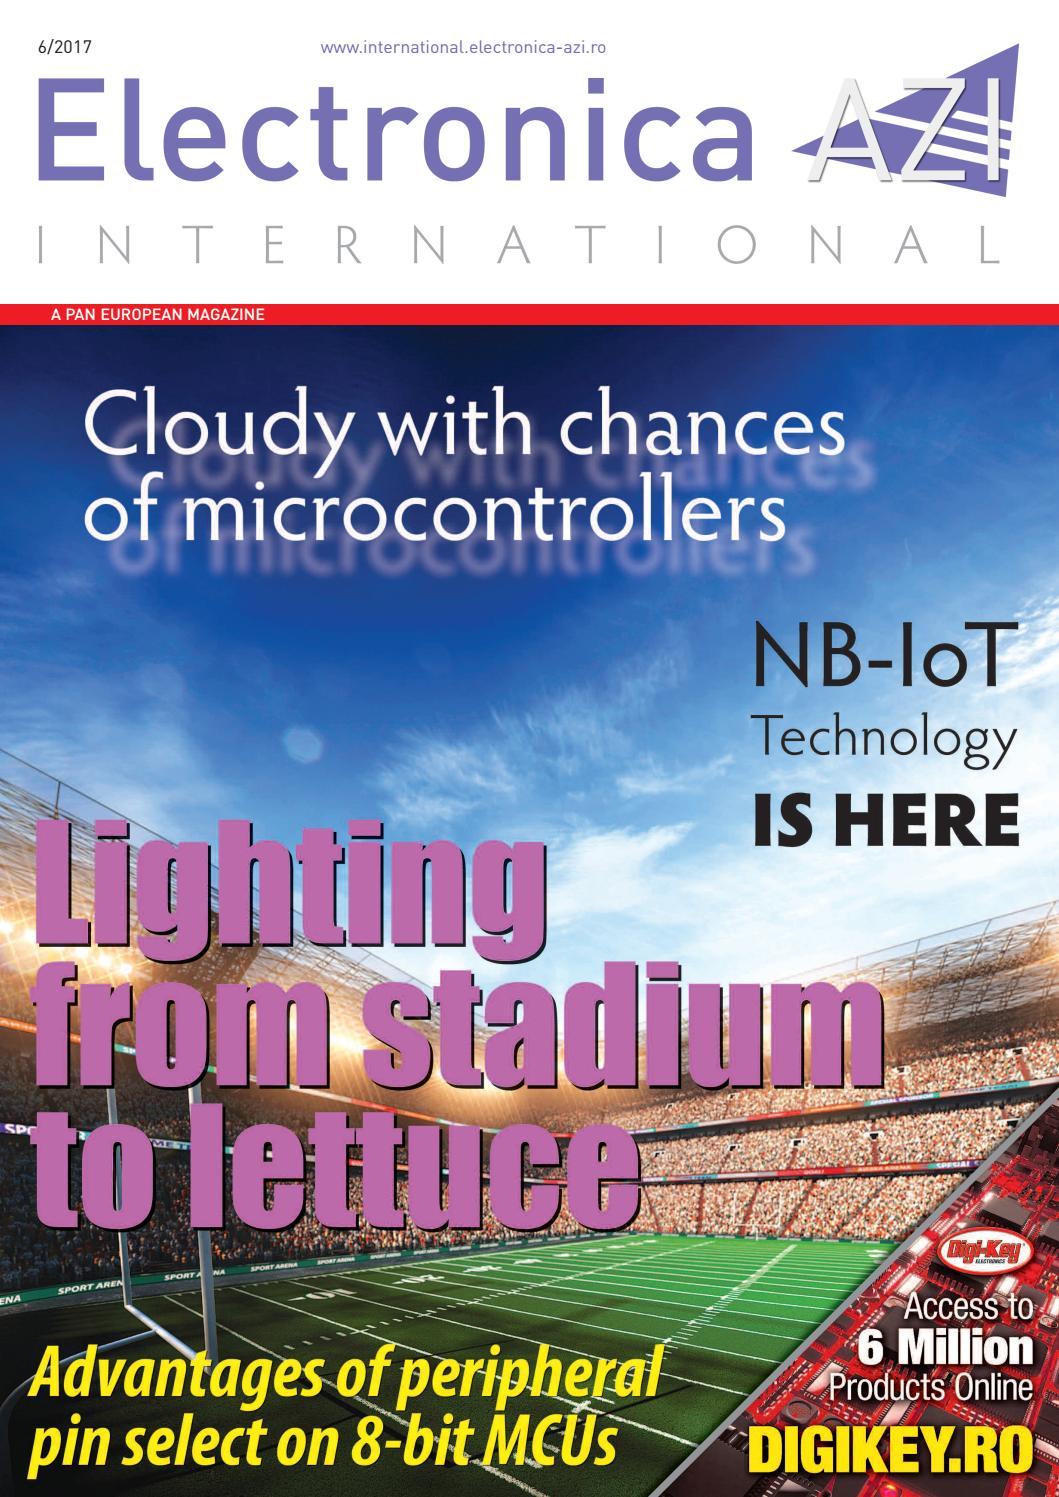 Electronica Azi International No 6 December 2017 By Esp Issuu Lowcost Shipment Shock Sensor Using A 6pin Sot23 Microcontroller